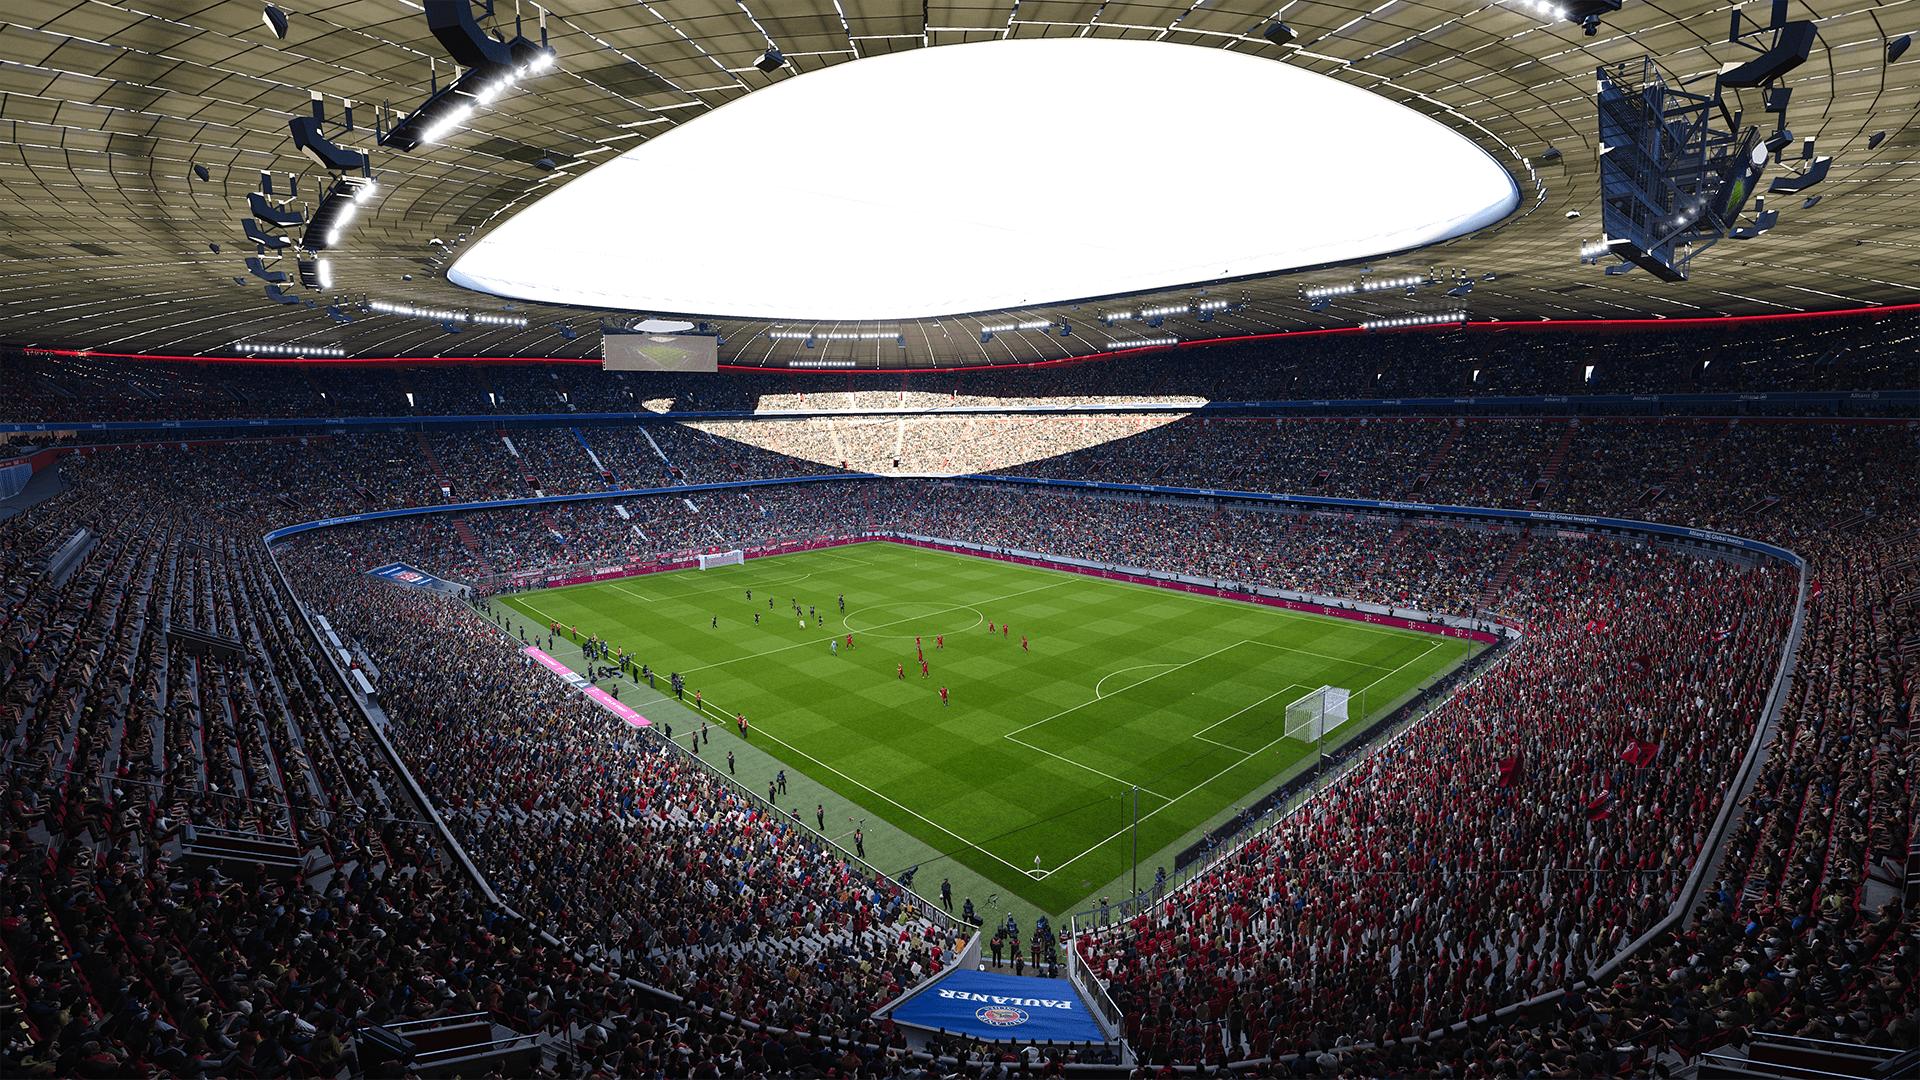 eFootball PES 2021 SEASON UPDATE: Arsenal Edition (US) | NCSA (203d6a02-2141-473c-898d-243cc1222c3e)